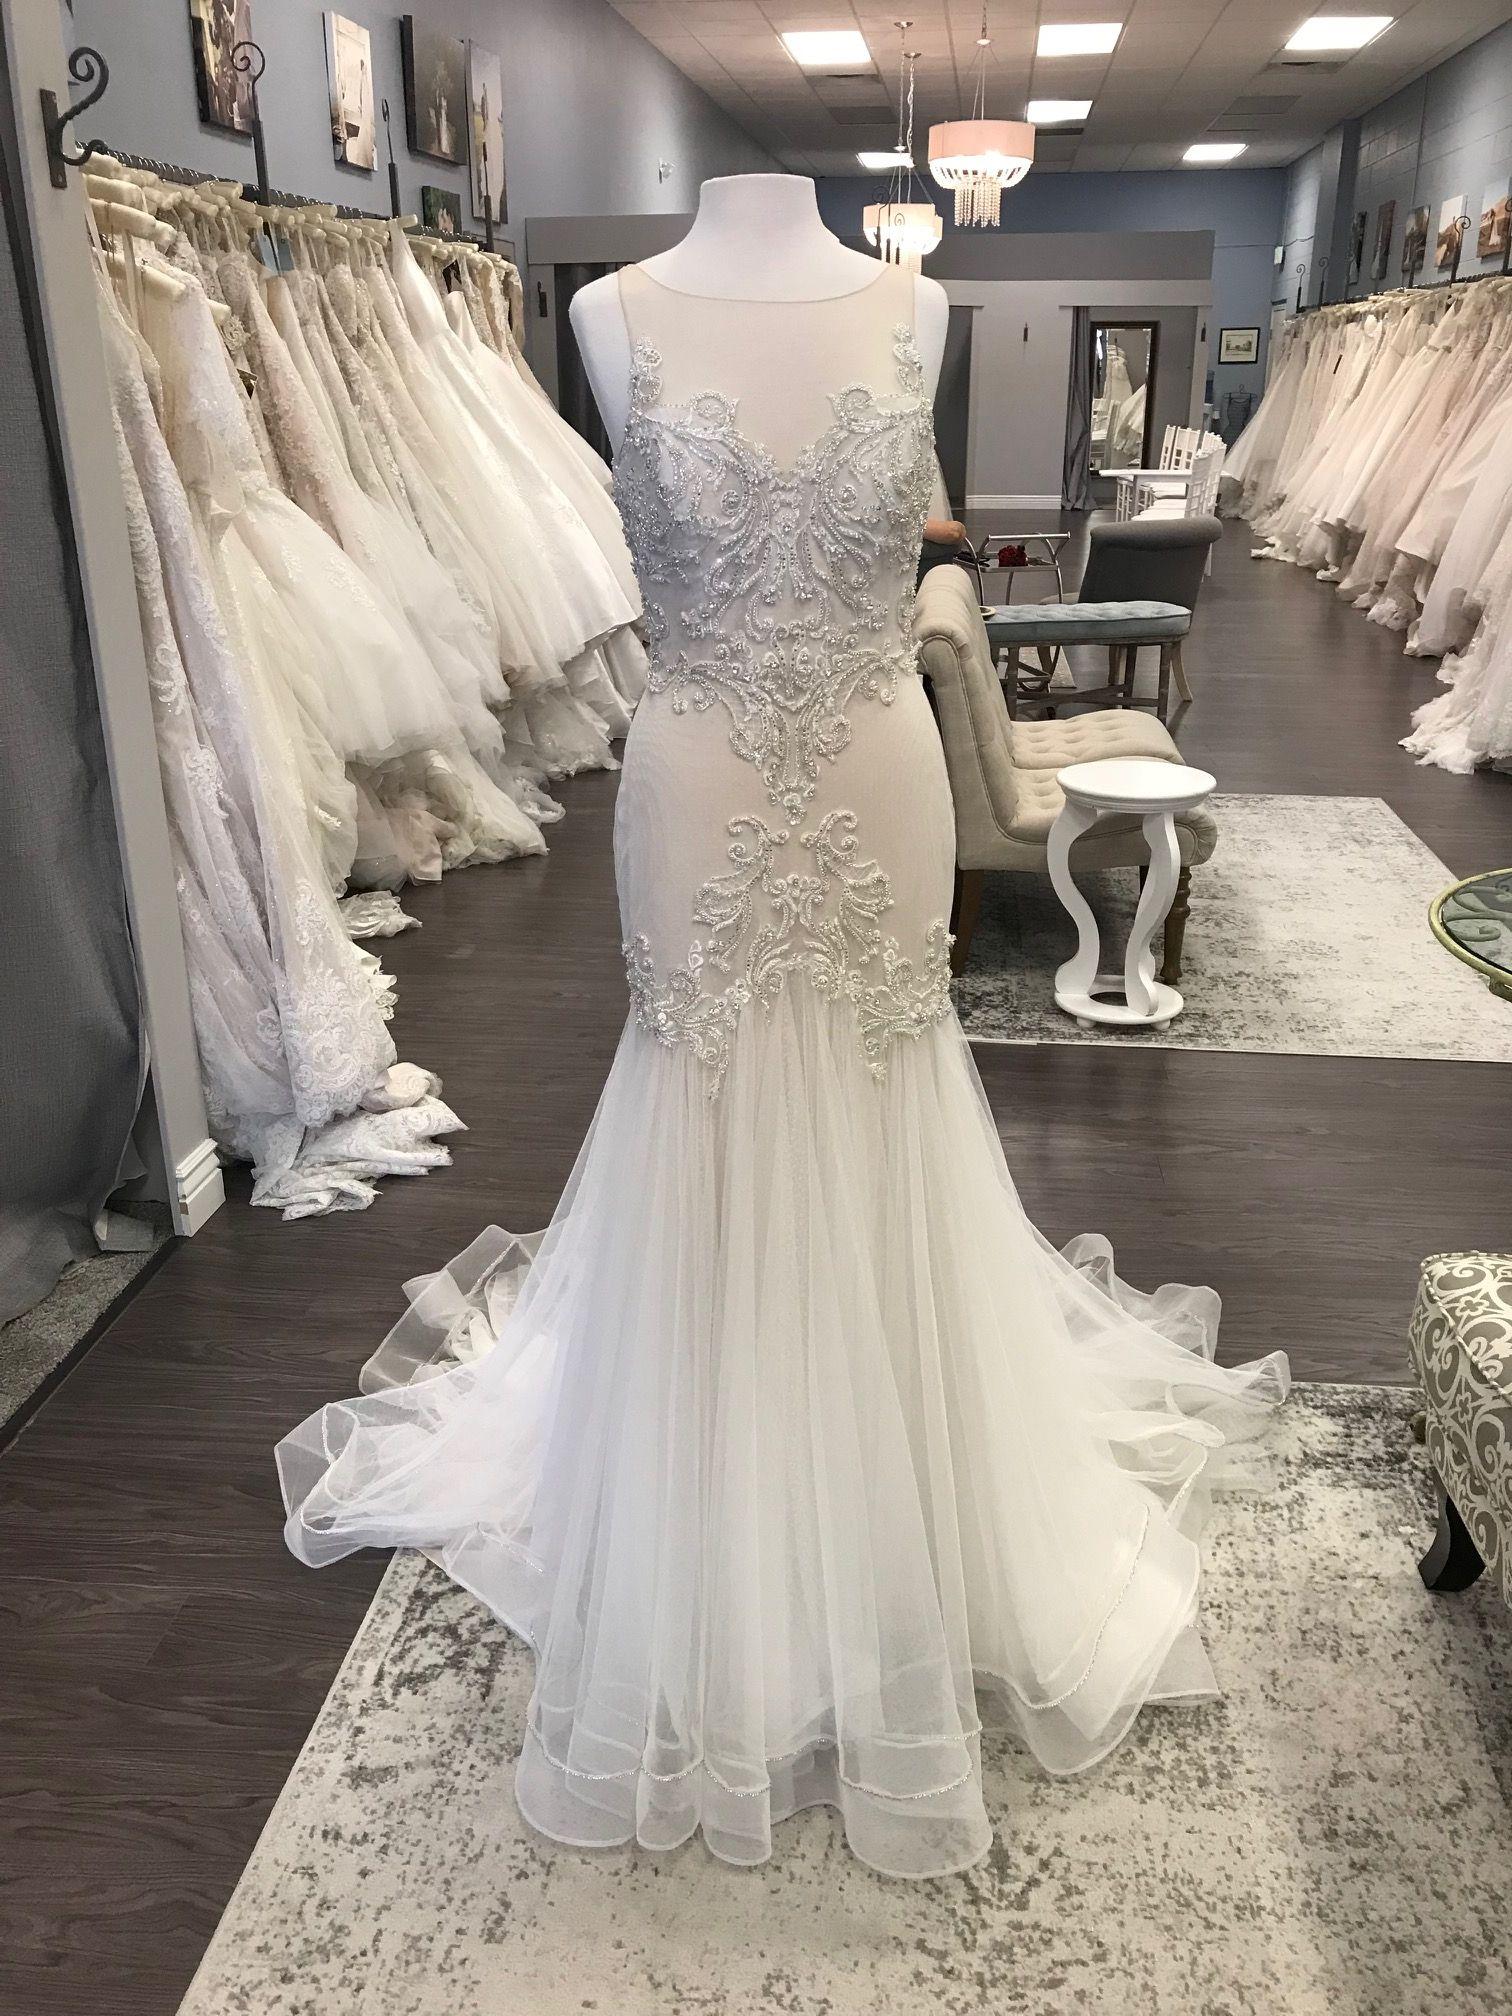 Maggie Sottero Khloe Wedding Dress Sample Size 10 400 Wedding Dresses Under 500 Big Wedding Dresses Royal Wedding Dress